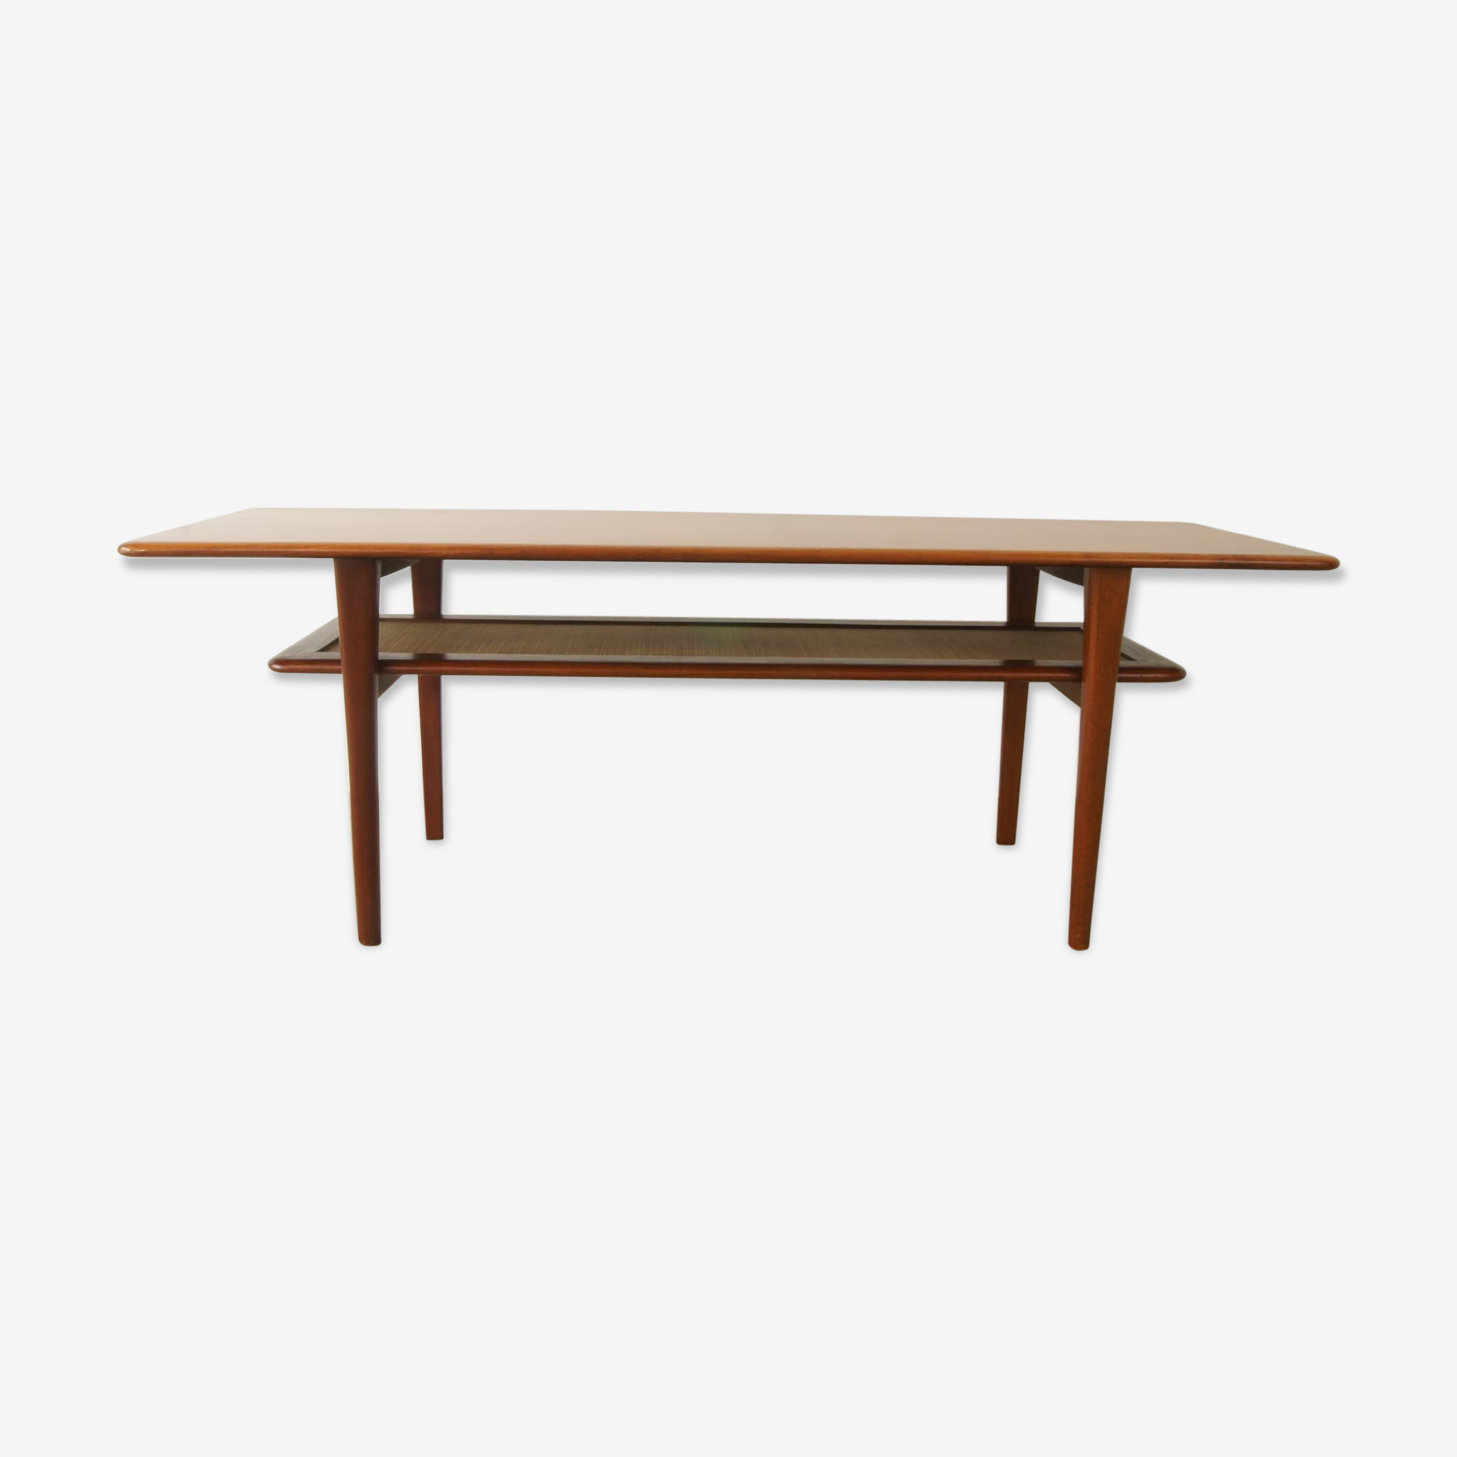 Table basse danoise années 1960's